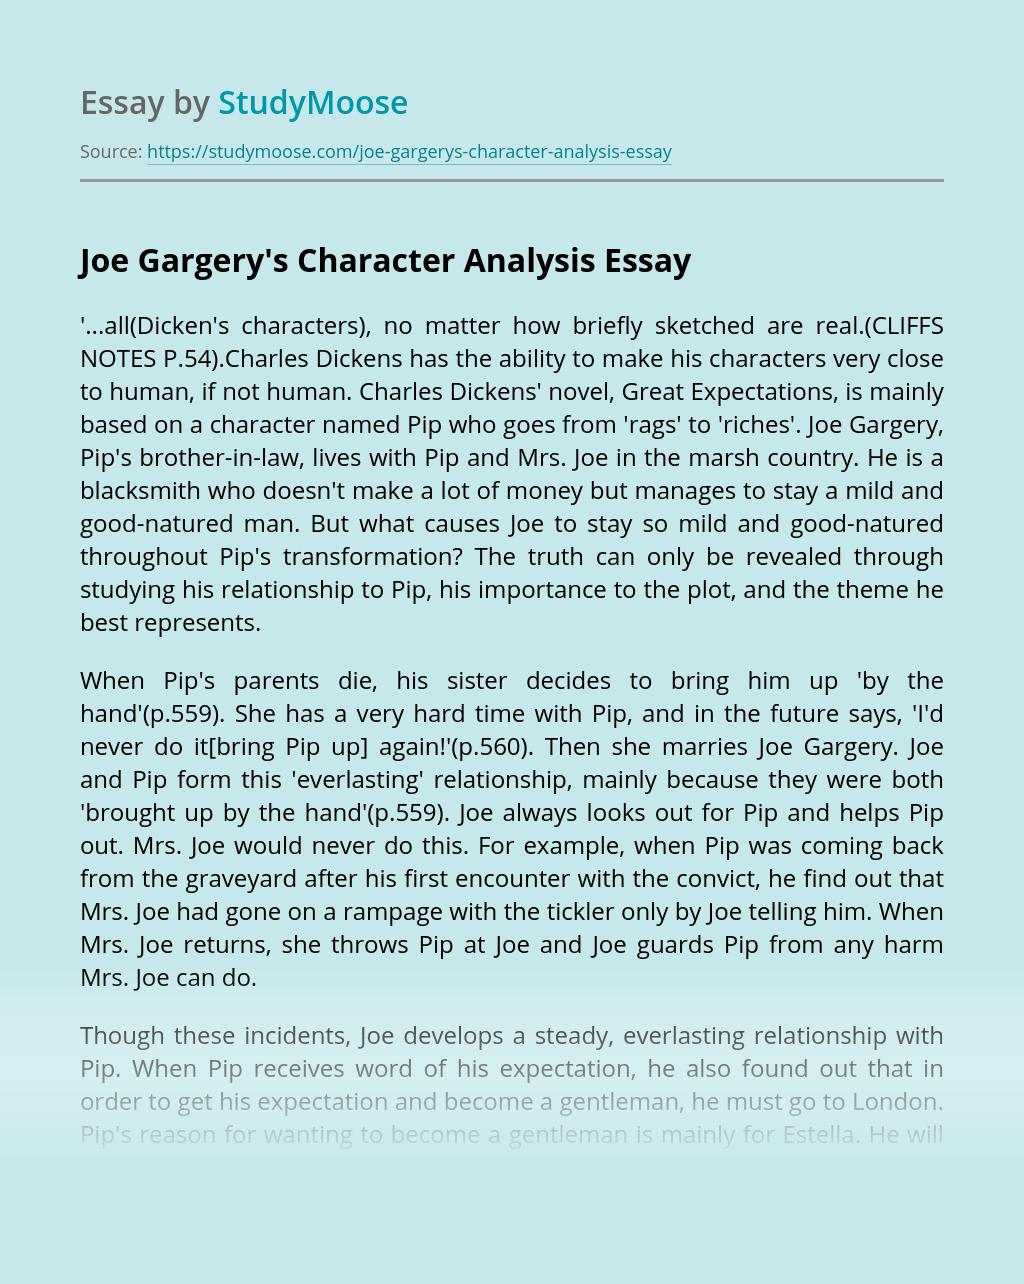 Joe Gargery's Character Analysis